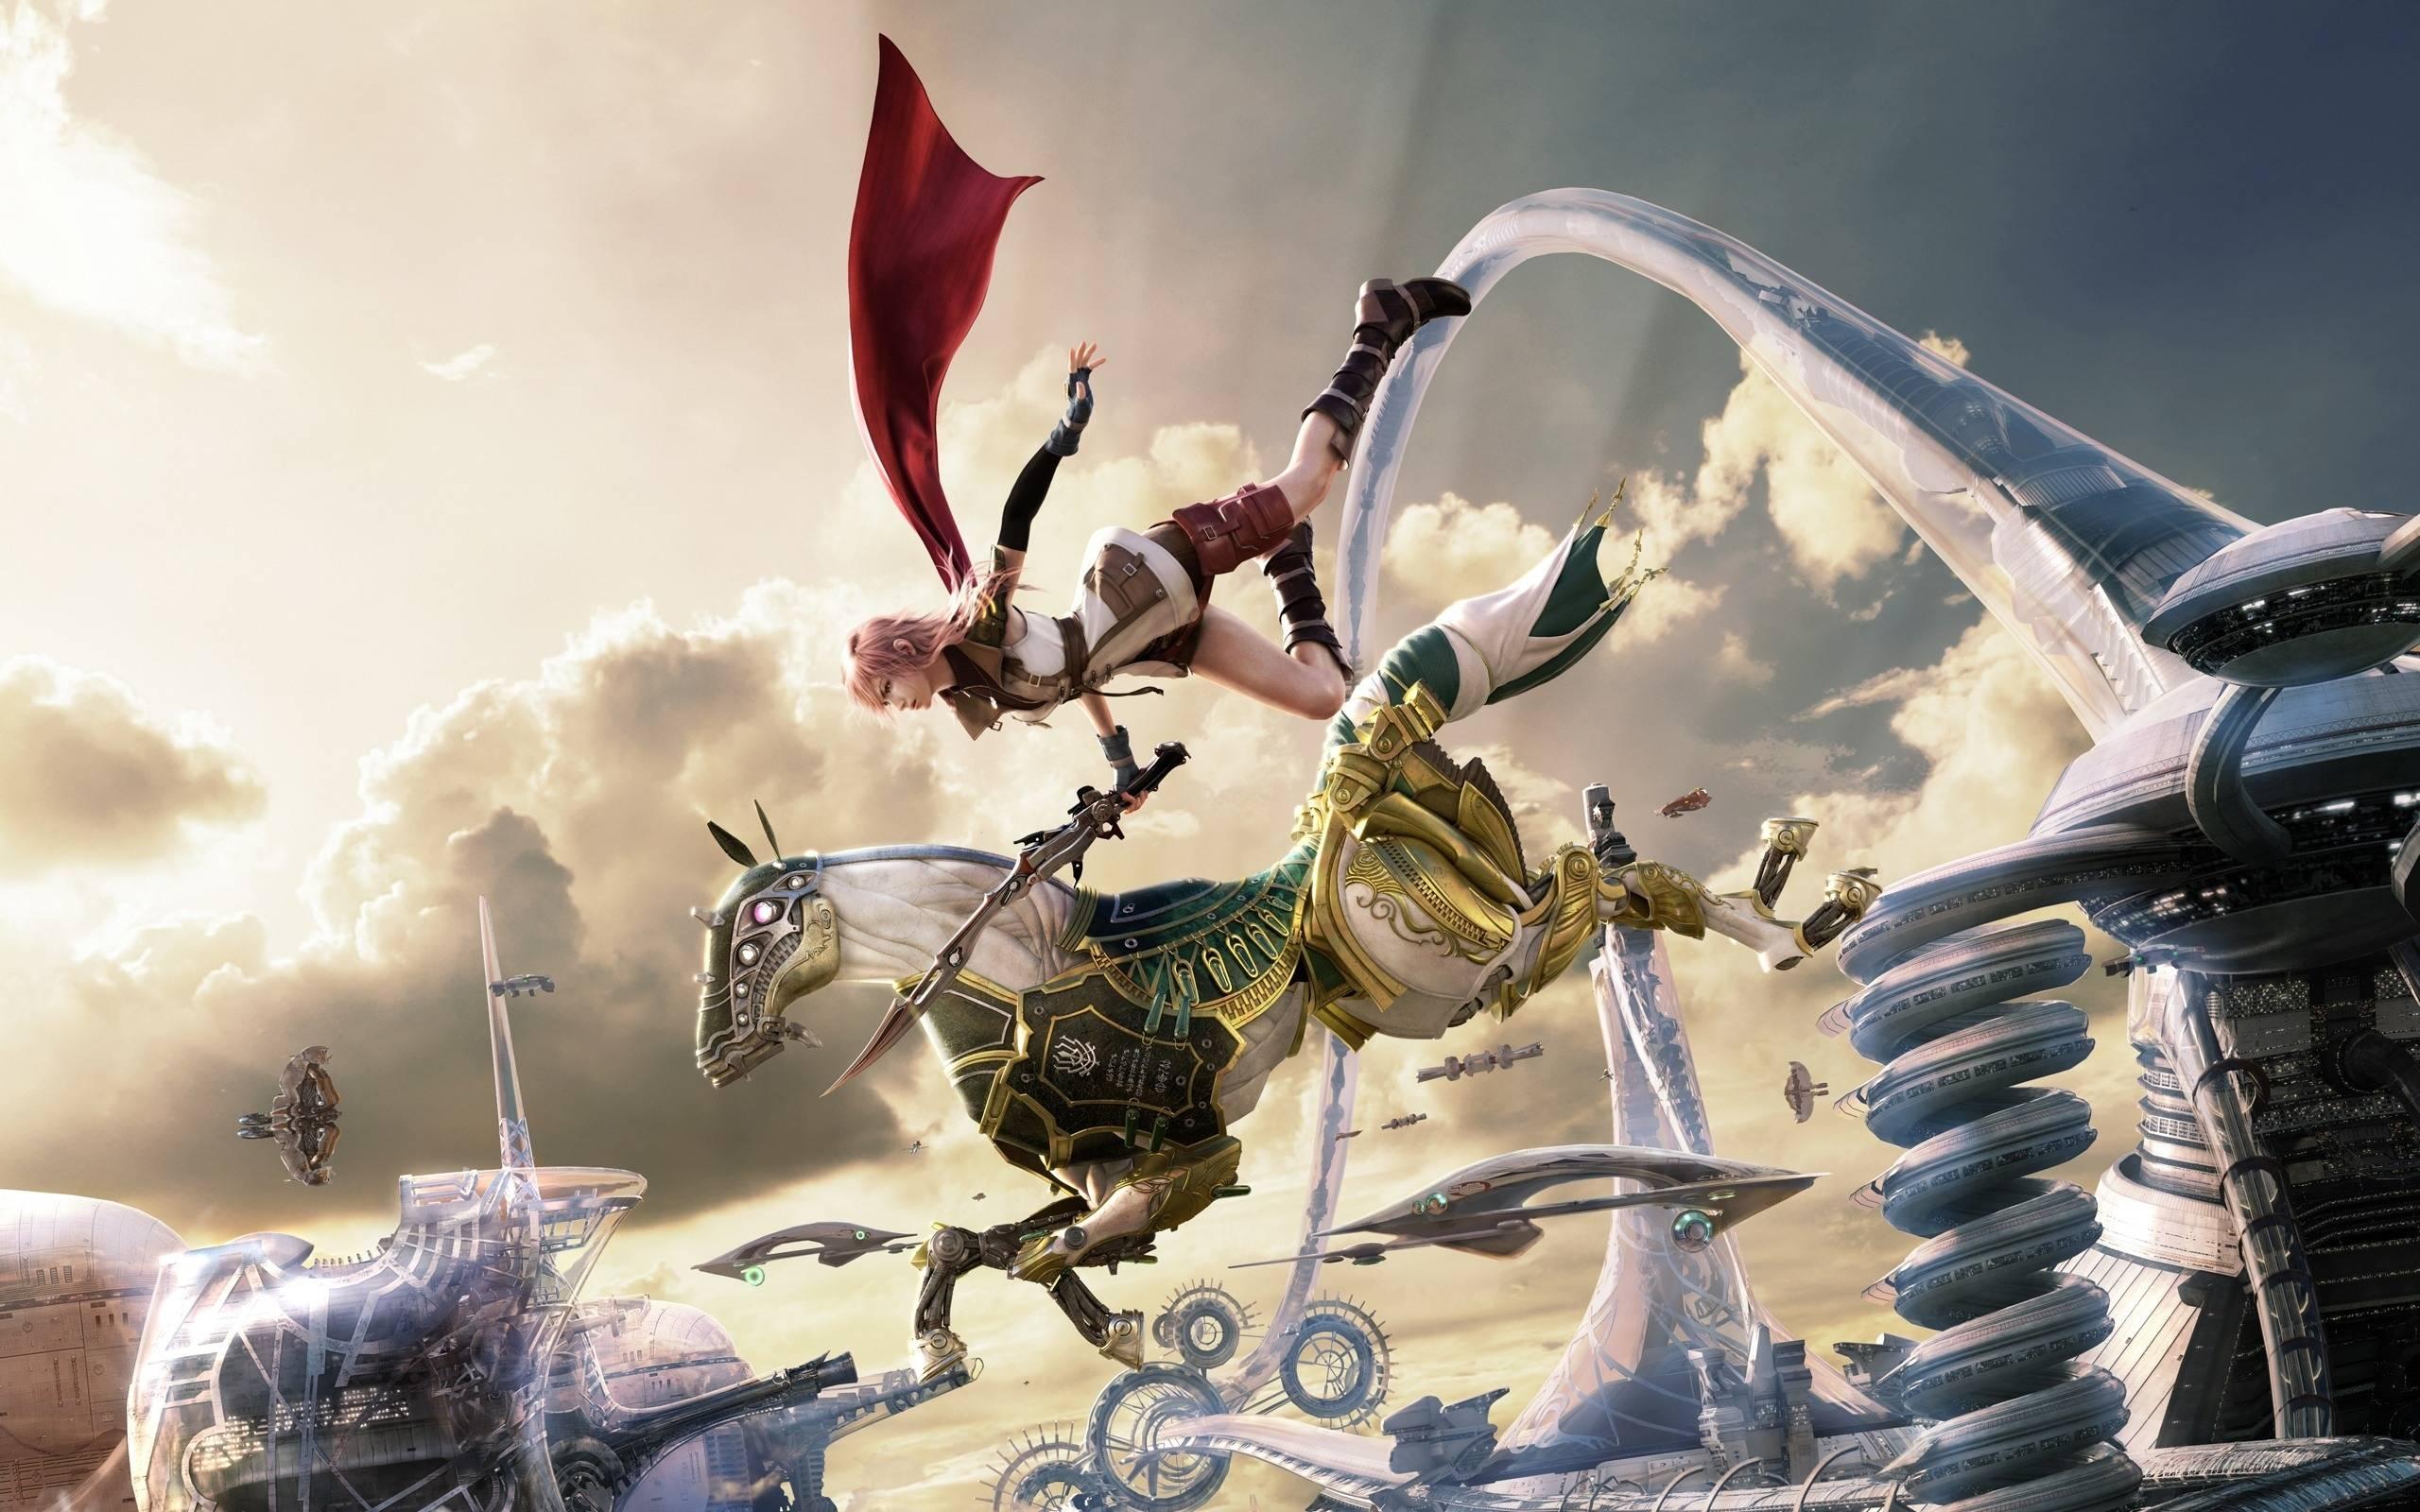 Final Fantasy Xiii Wallpaper: Final Fantasy Wallpapers HD